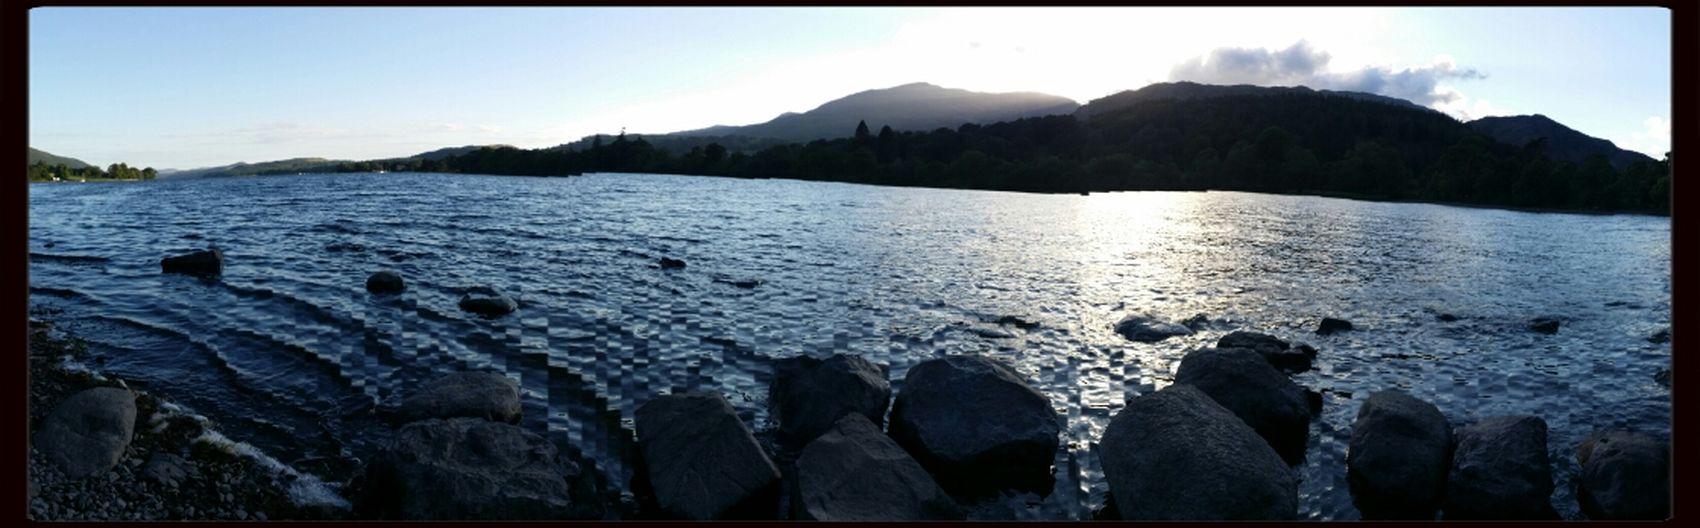 Lakedistrict Calm Serine